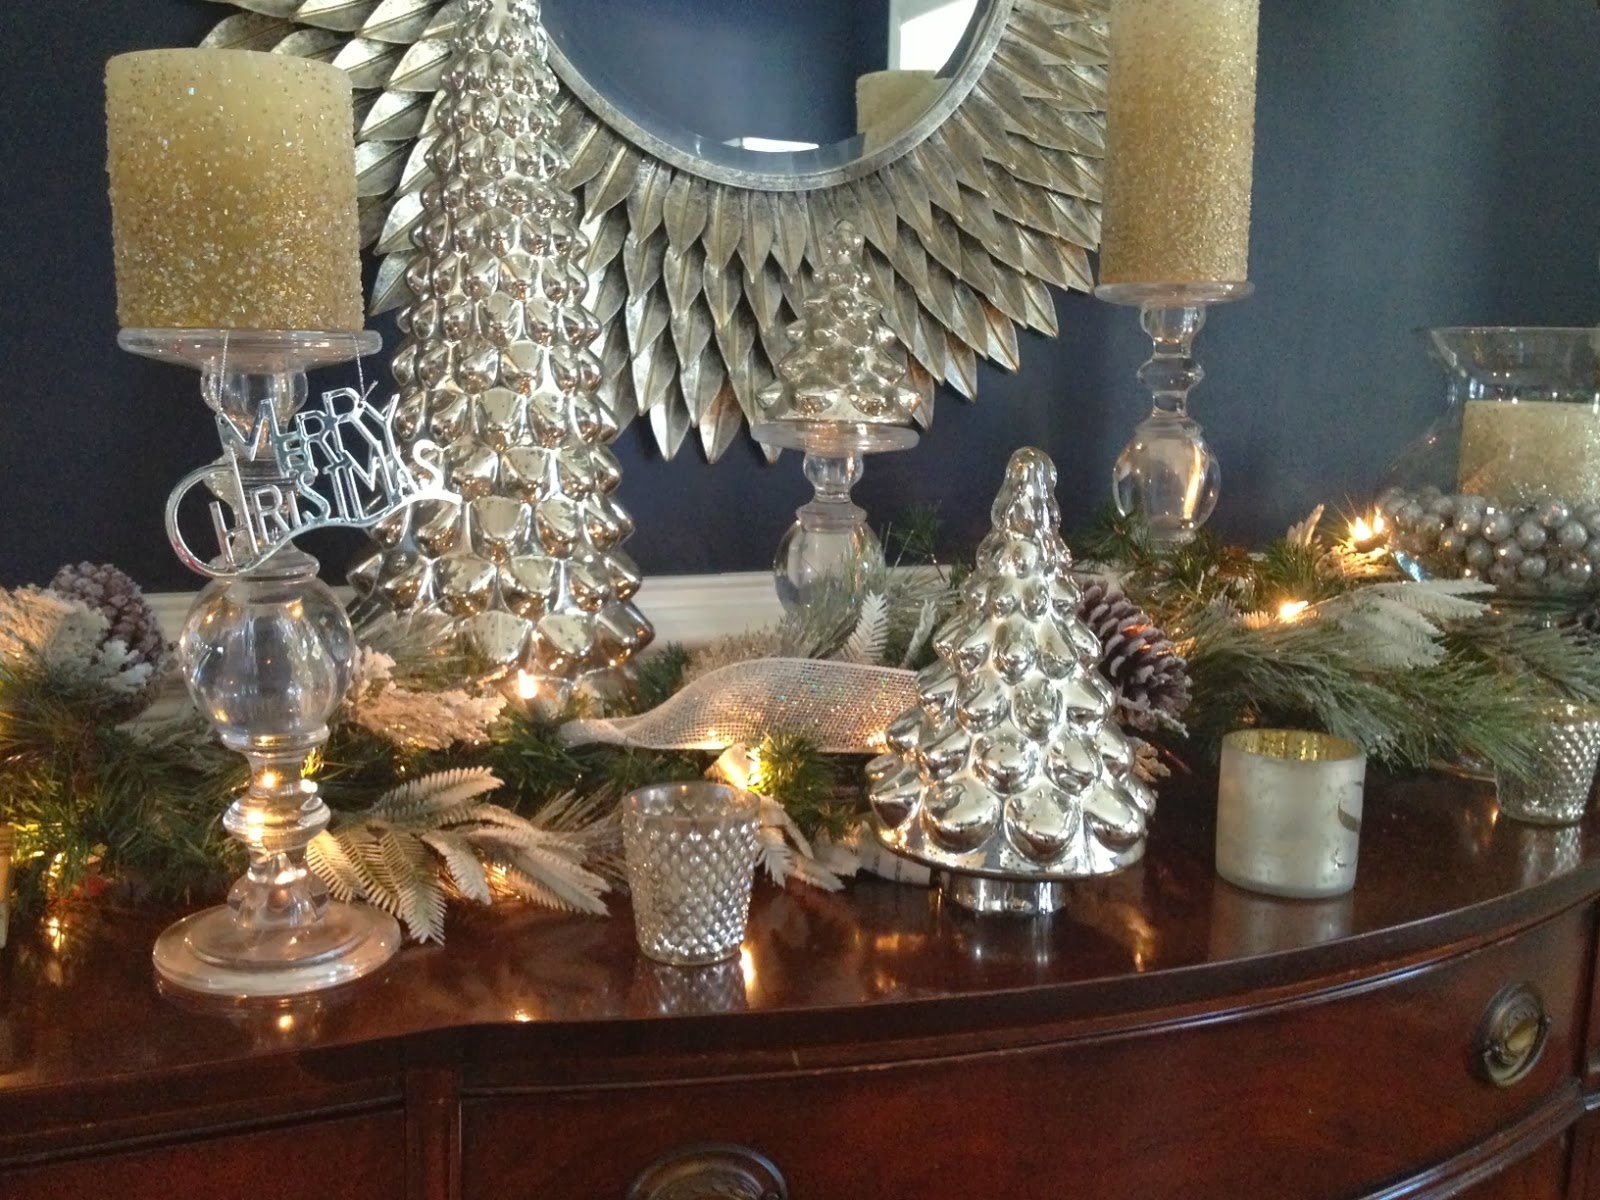 pottery barn mercury glass tree - Mercury Glass Christmas Trees